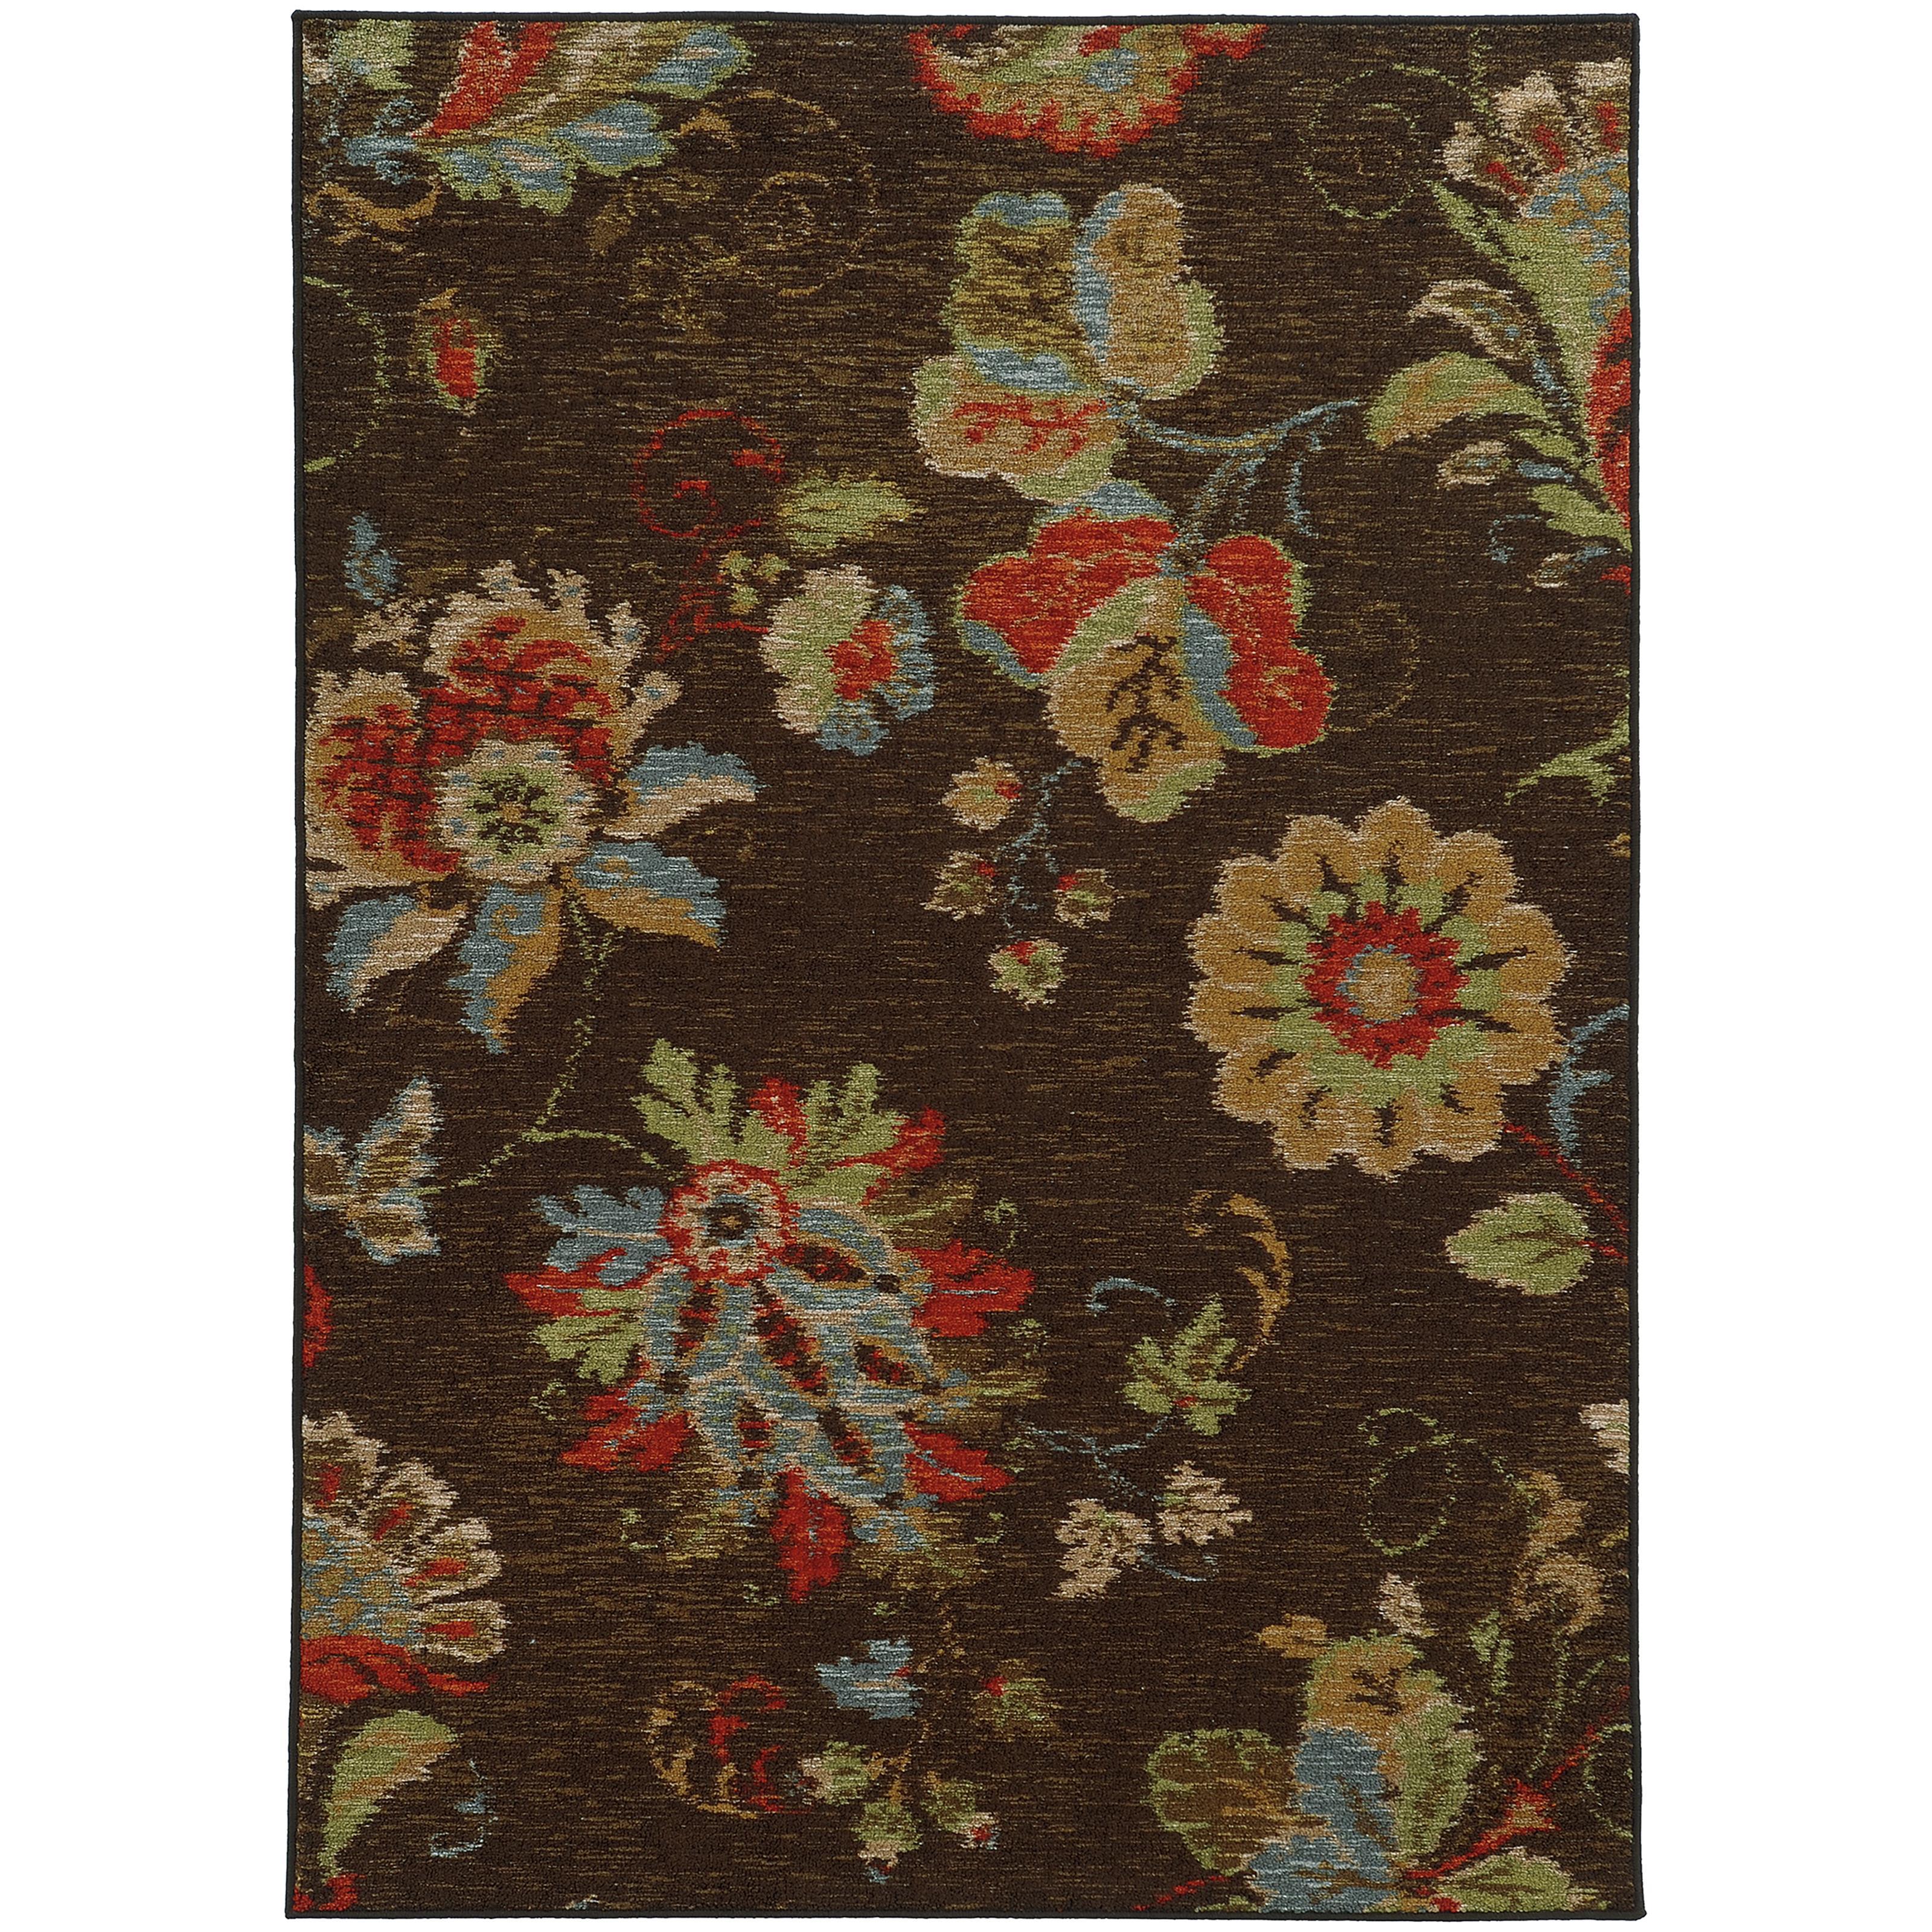 "Arabella 2' 2"" X  3' 9"" Rug by Oriental Weavers at Steger's Furniture"